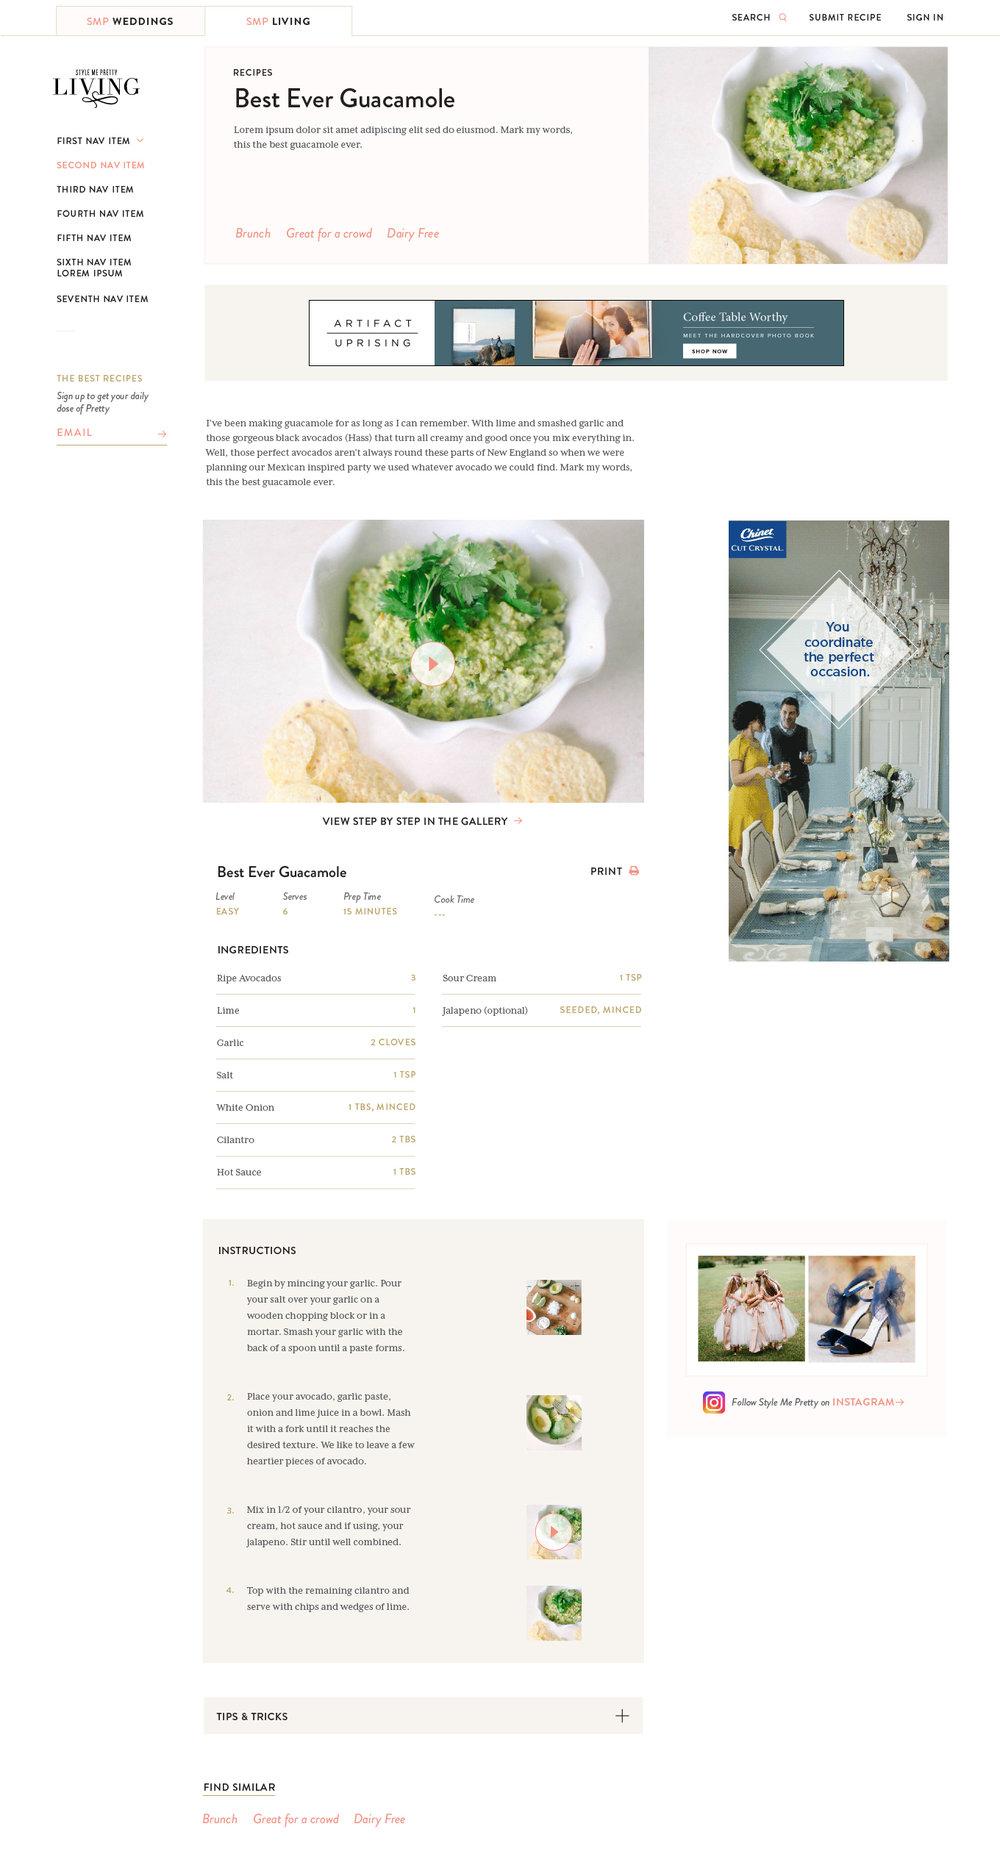 SMP_Article_Recipes_Desktop.jpg